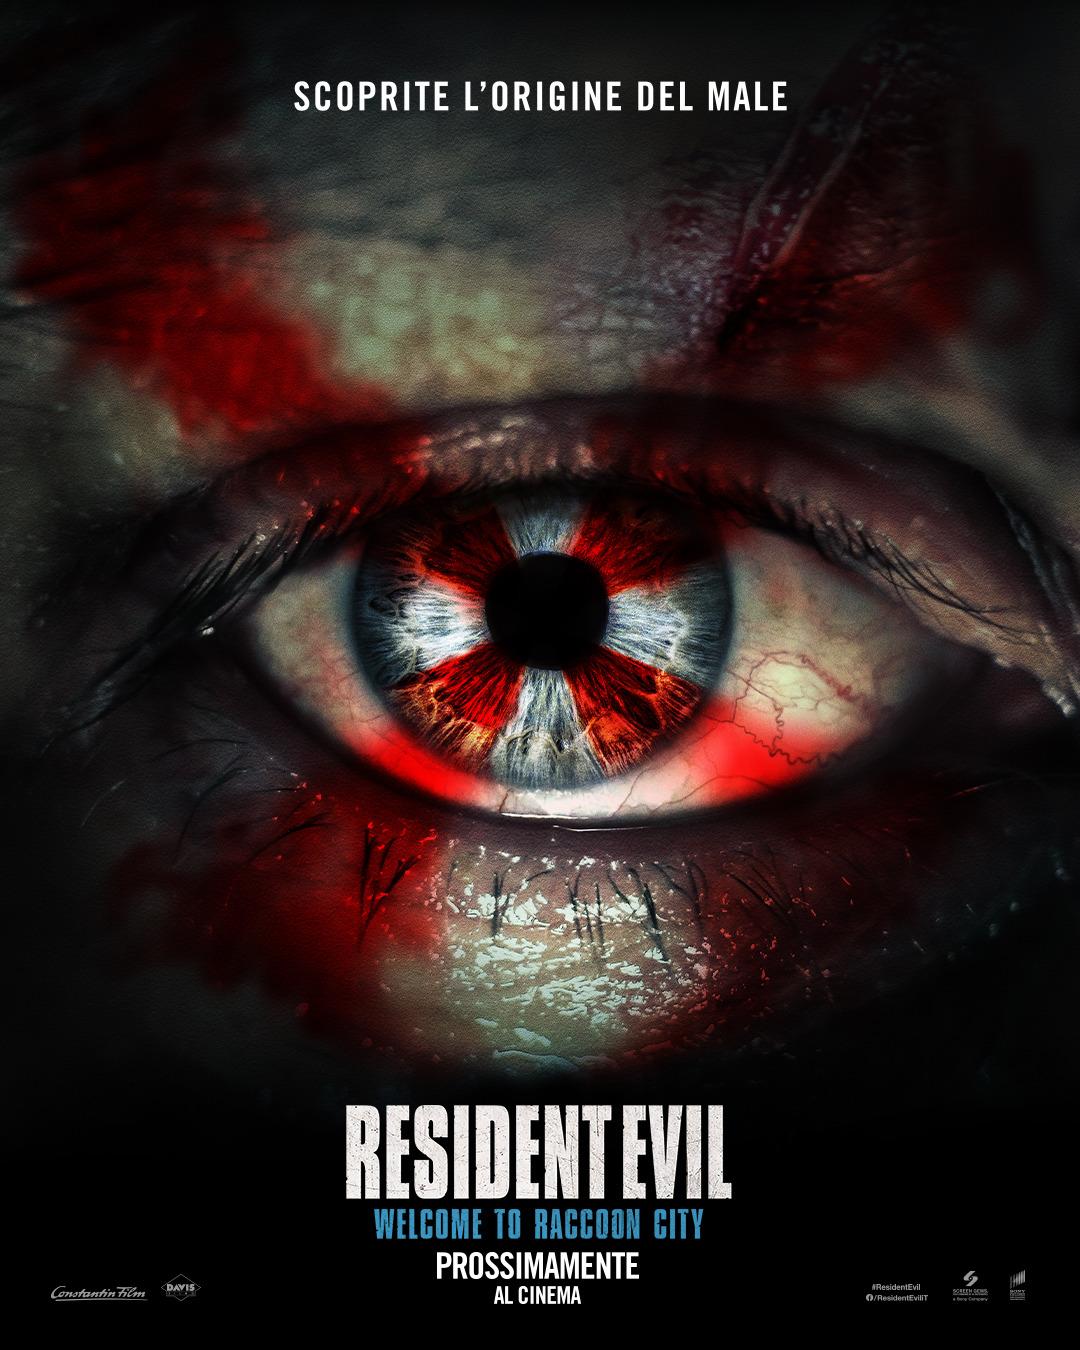 Resident Evil: Welcome To Raccoon City | Il trailer ufficiale | Prossimamente al cinema